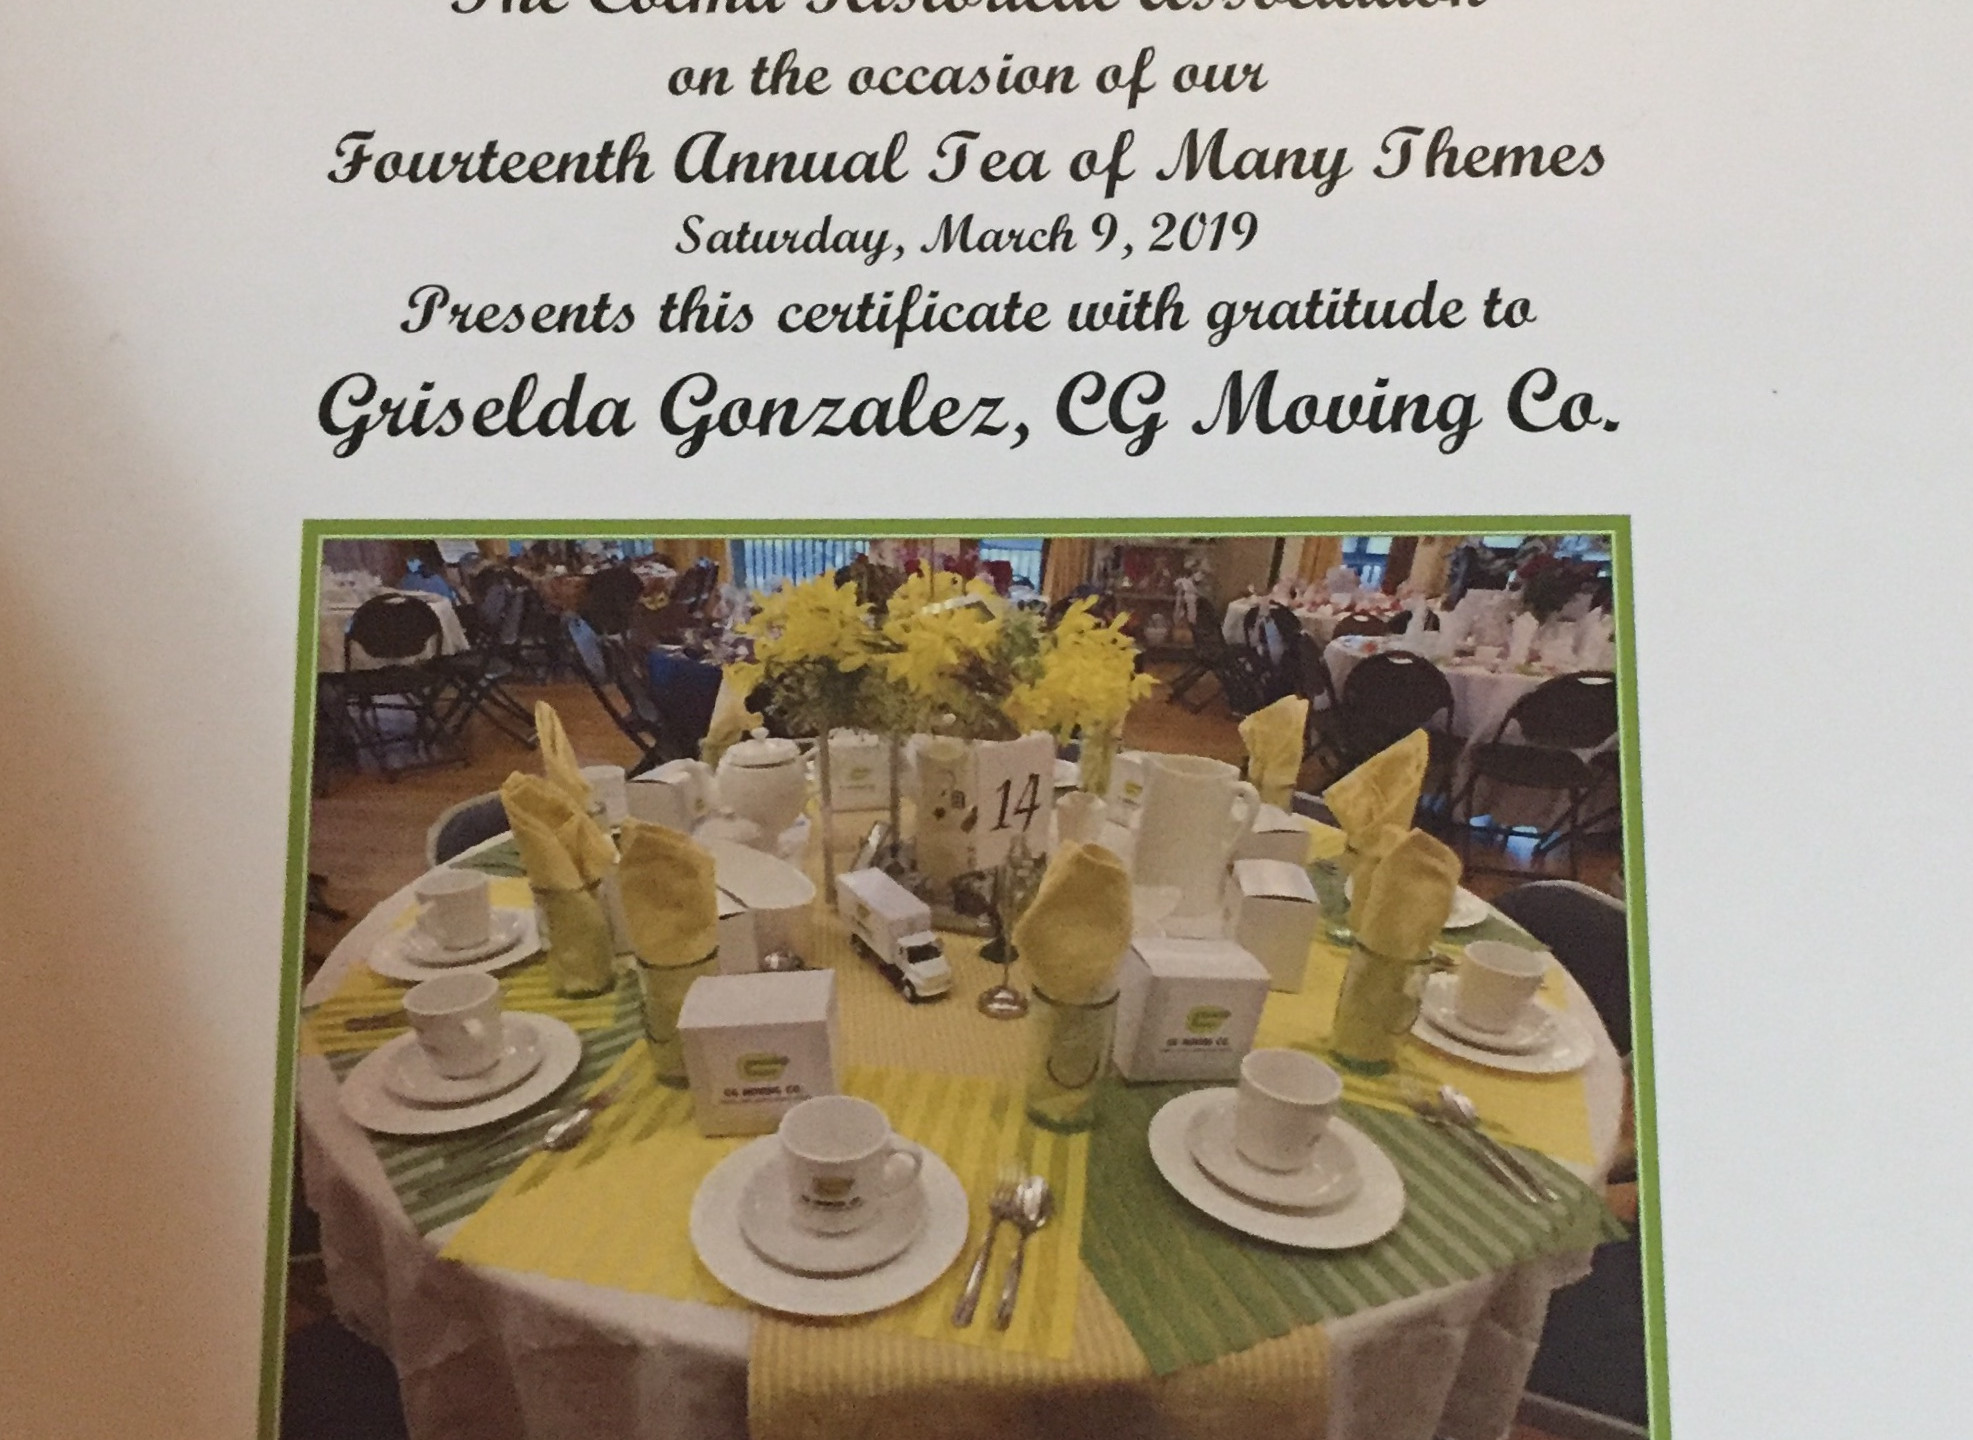 cgmoving Certificate of Appreciation